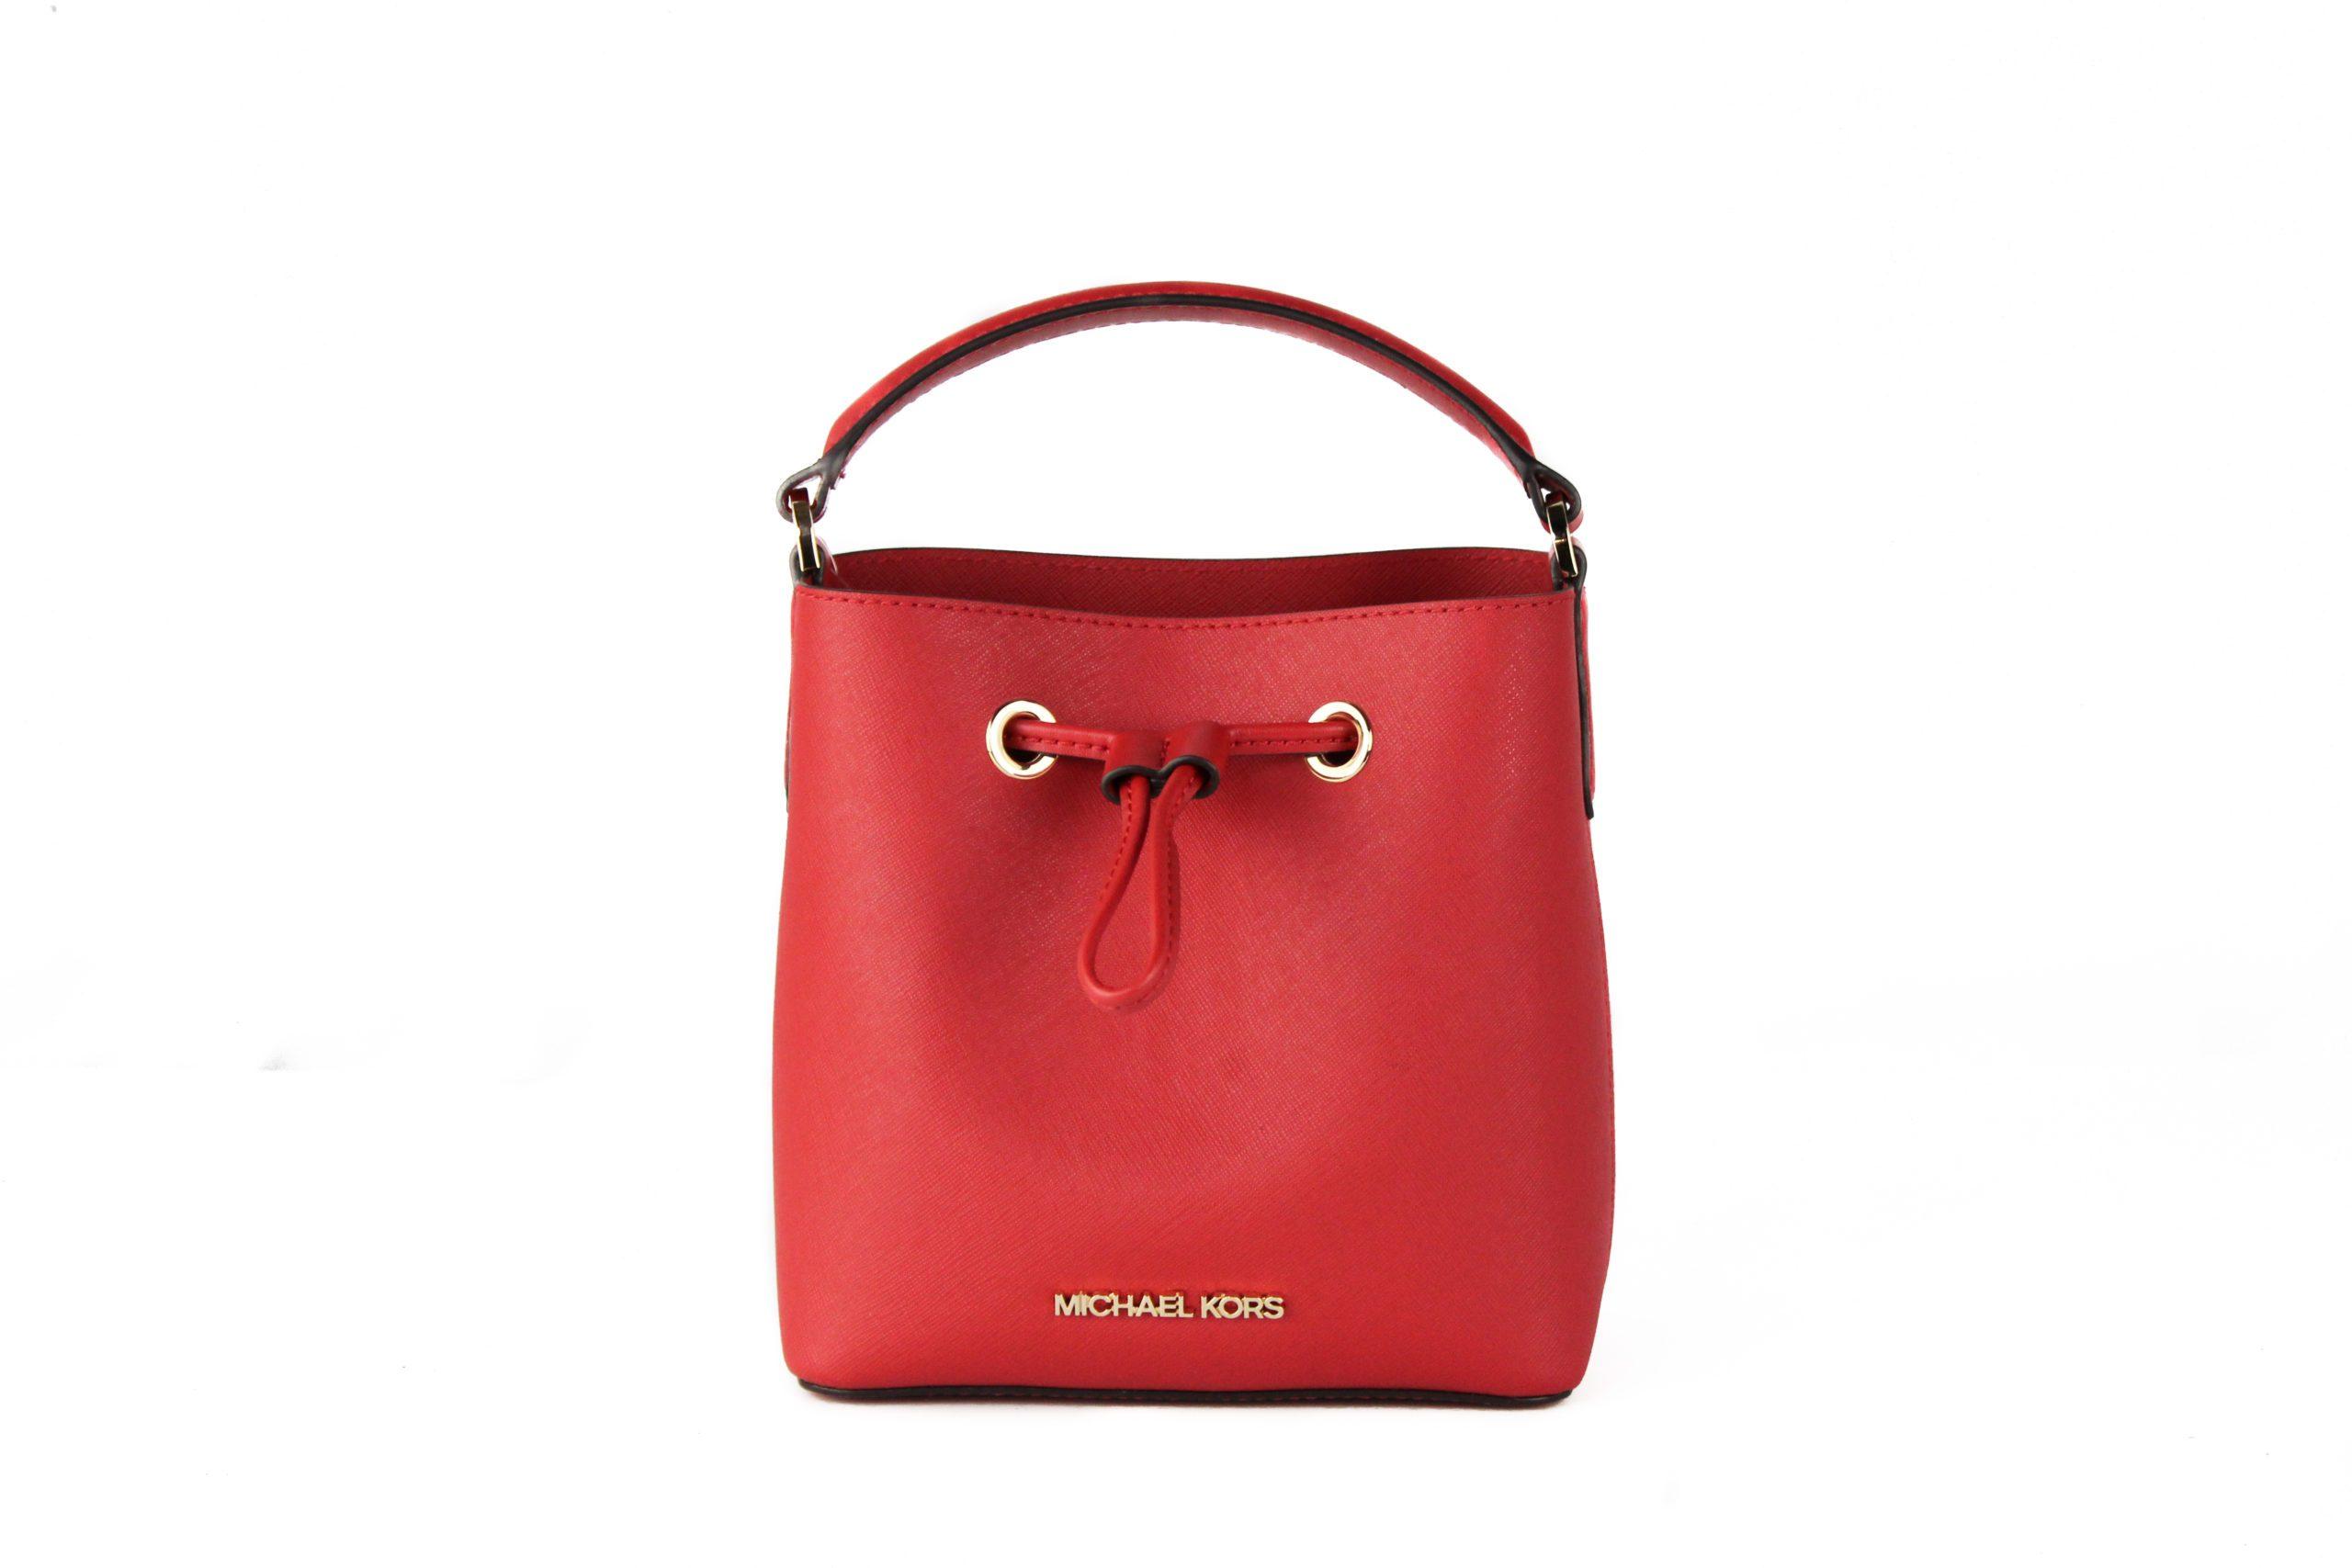 Michael Kors Women's Suri Small Leather Bucket Crossbody Bag Red 79409